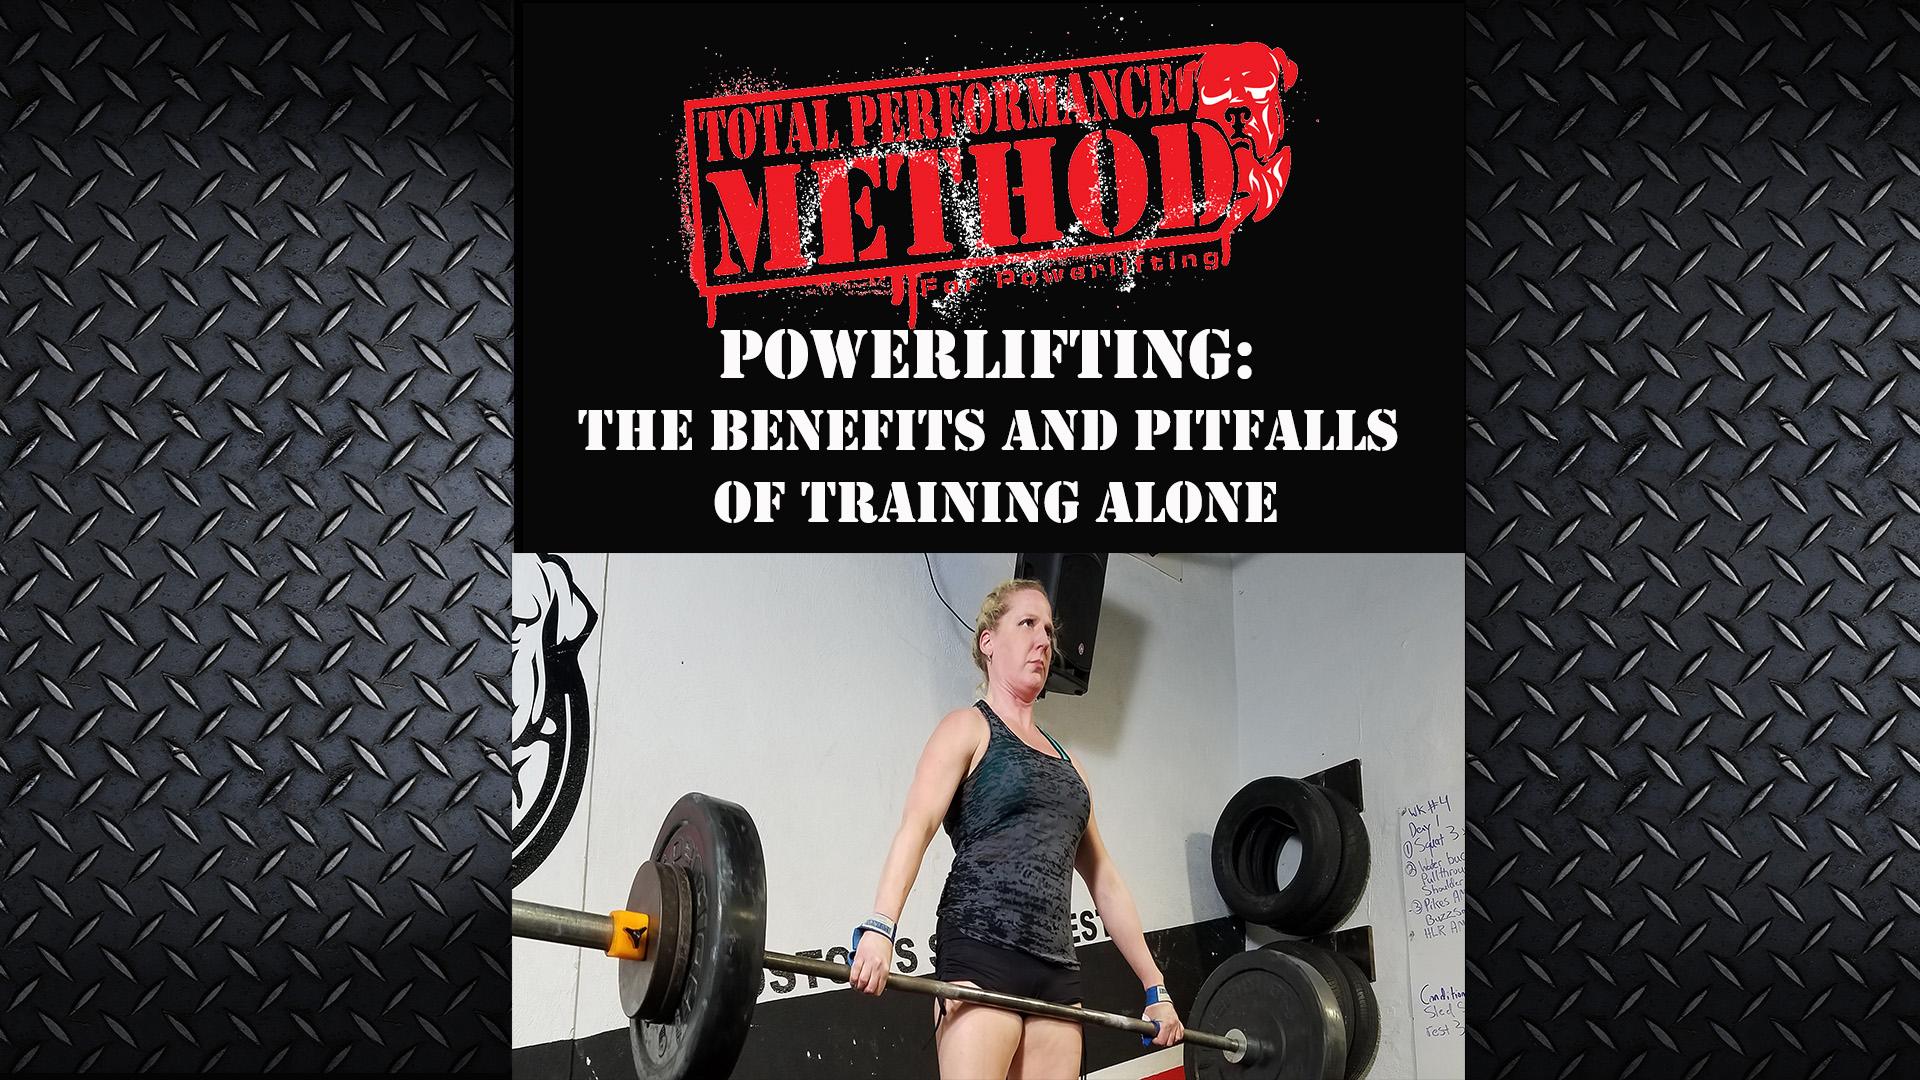 powerlifting, benefits, training alone, pitfalls, john romanowski